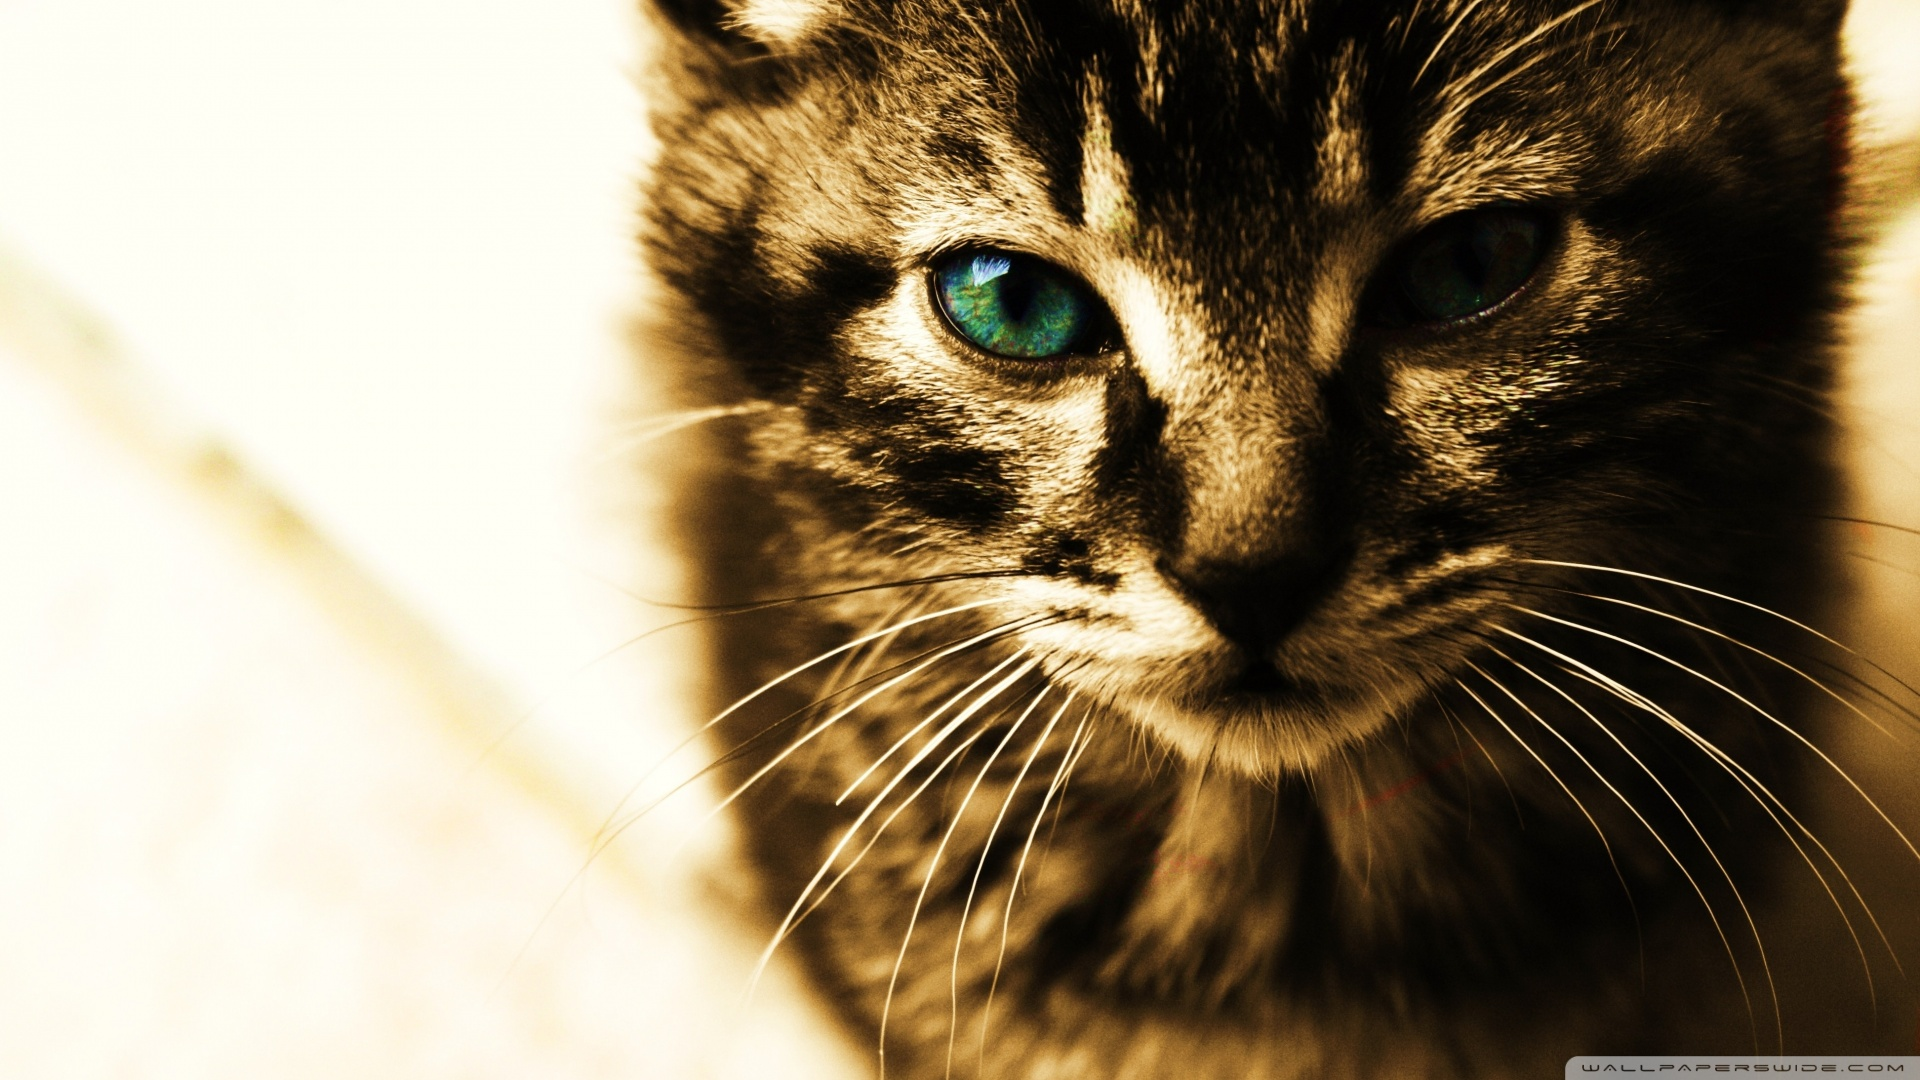 Green Eyes Kitten Wallpaper 1920x1080 Green Eyes Kitten 1920x1080